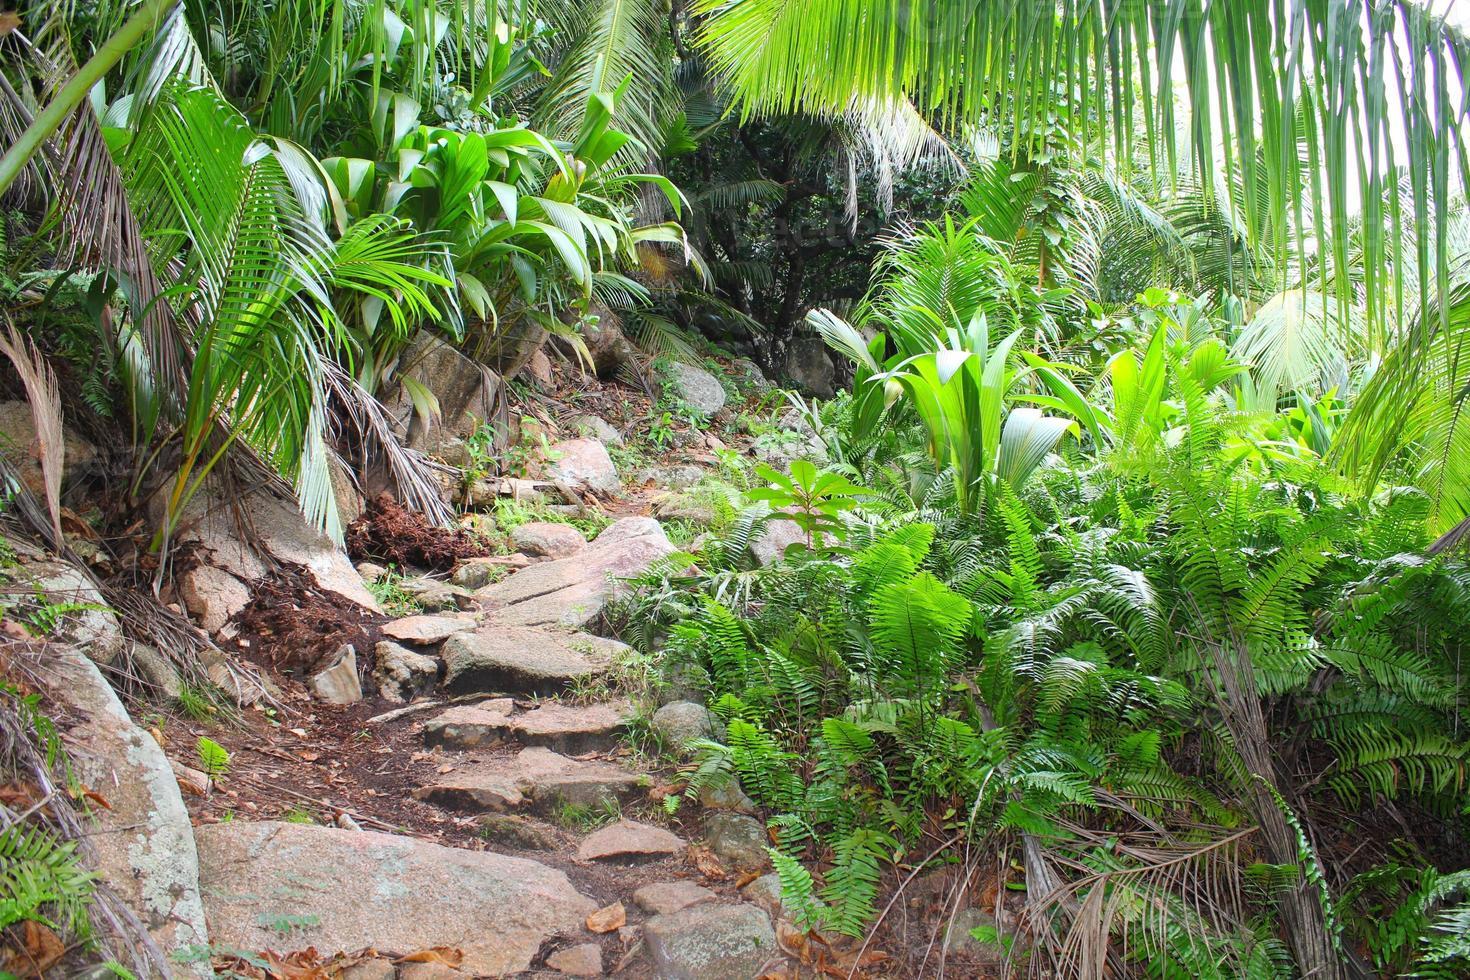 Jungle, rainforest photo